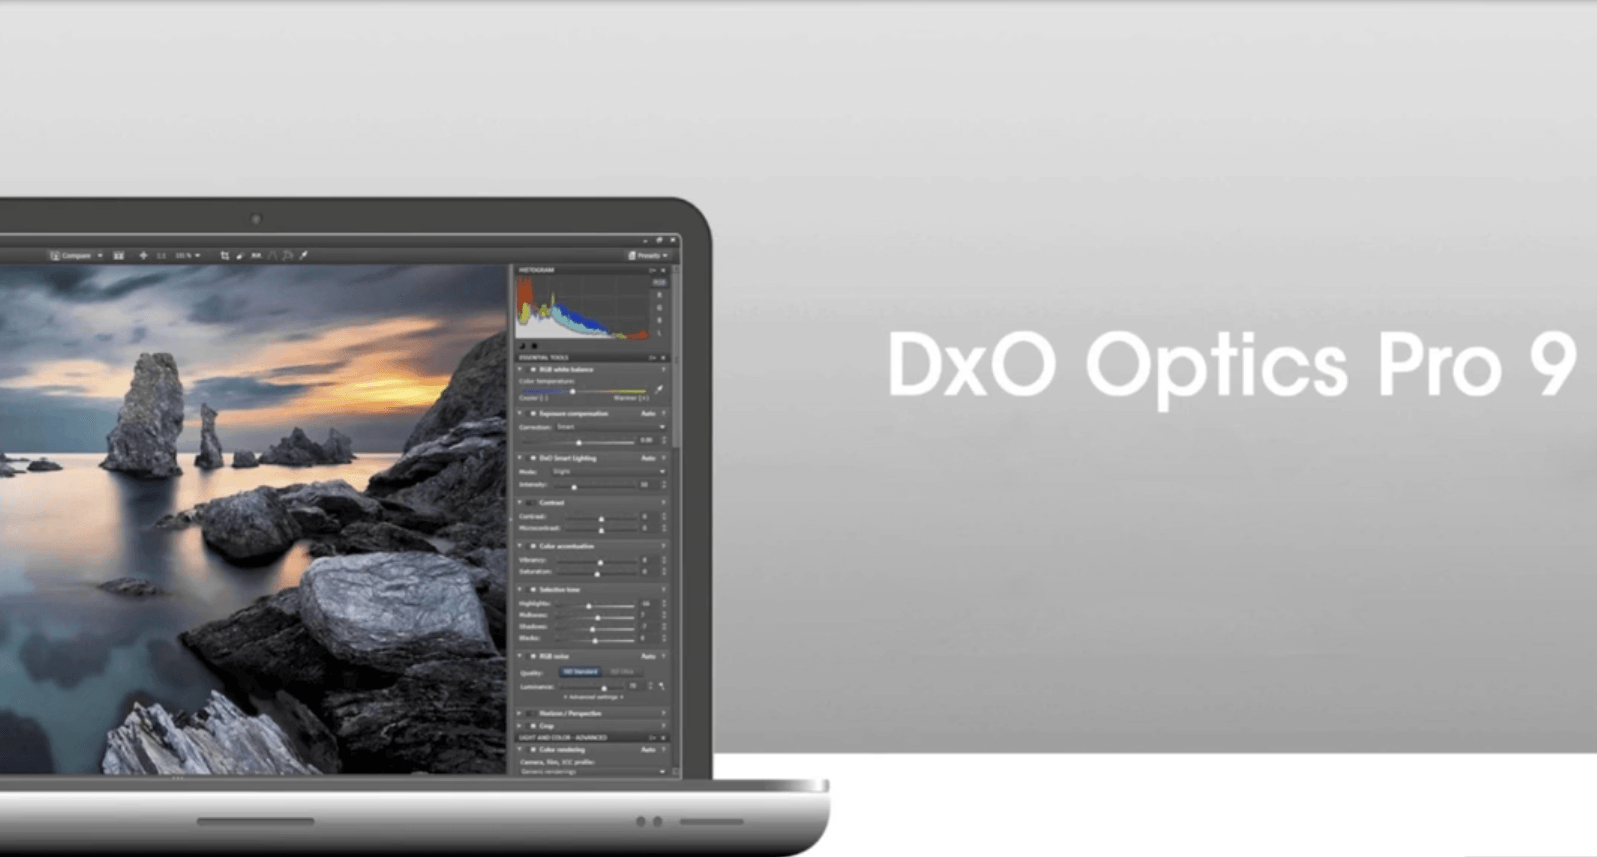 DxO OpticsPro 9 grátis